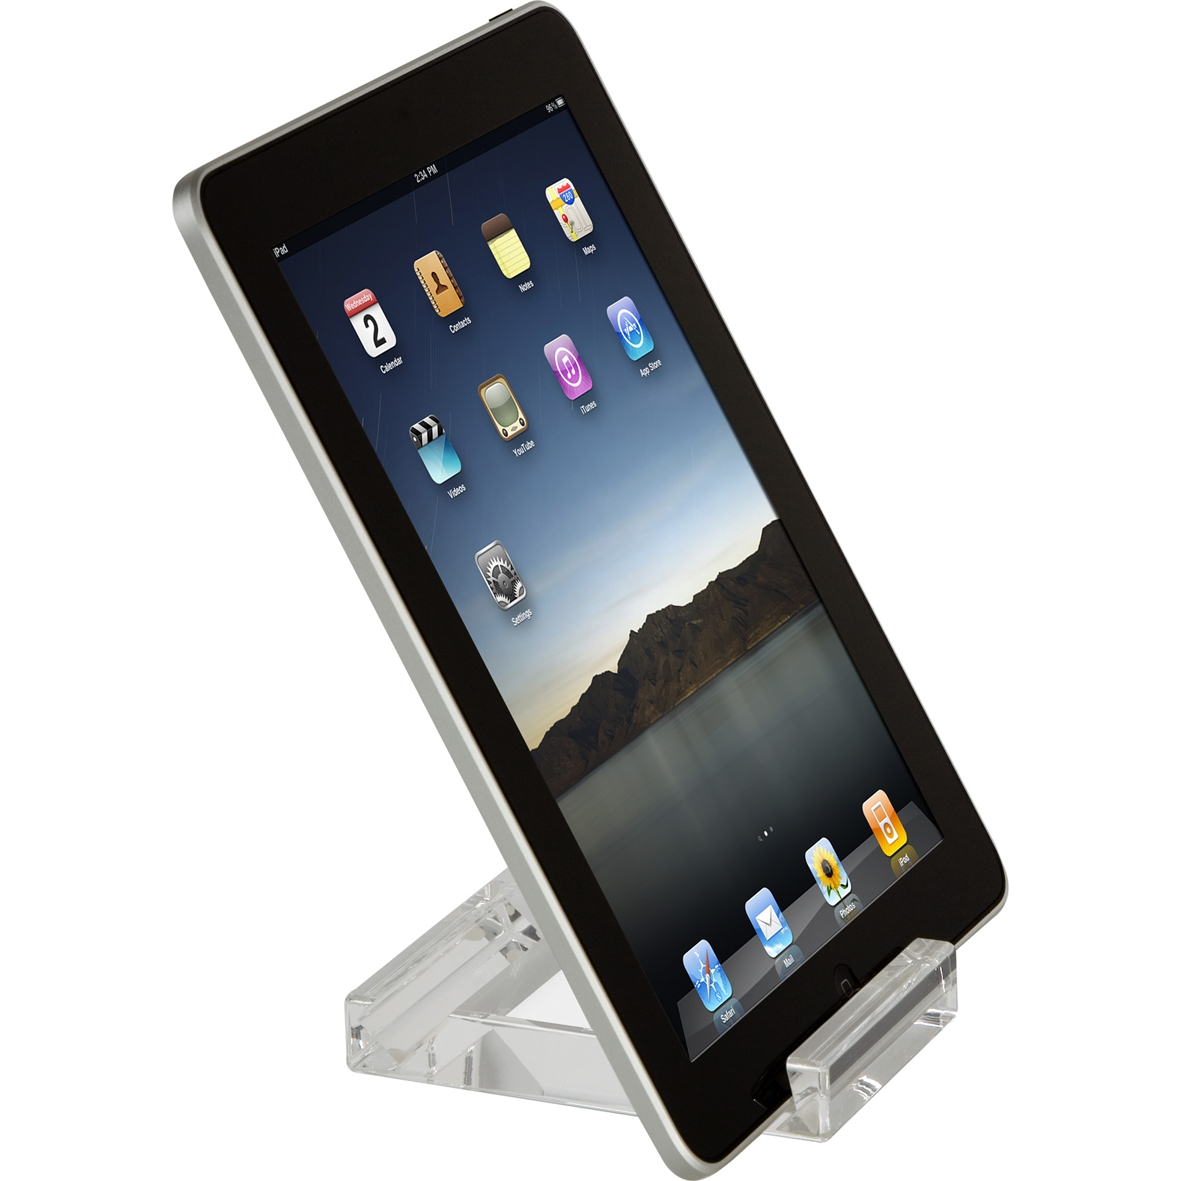 mini support pour tablette 7 10 transparent. Black Bedroom Furniture Sets. Home Design Ideas